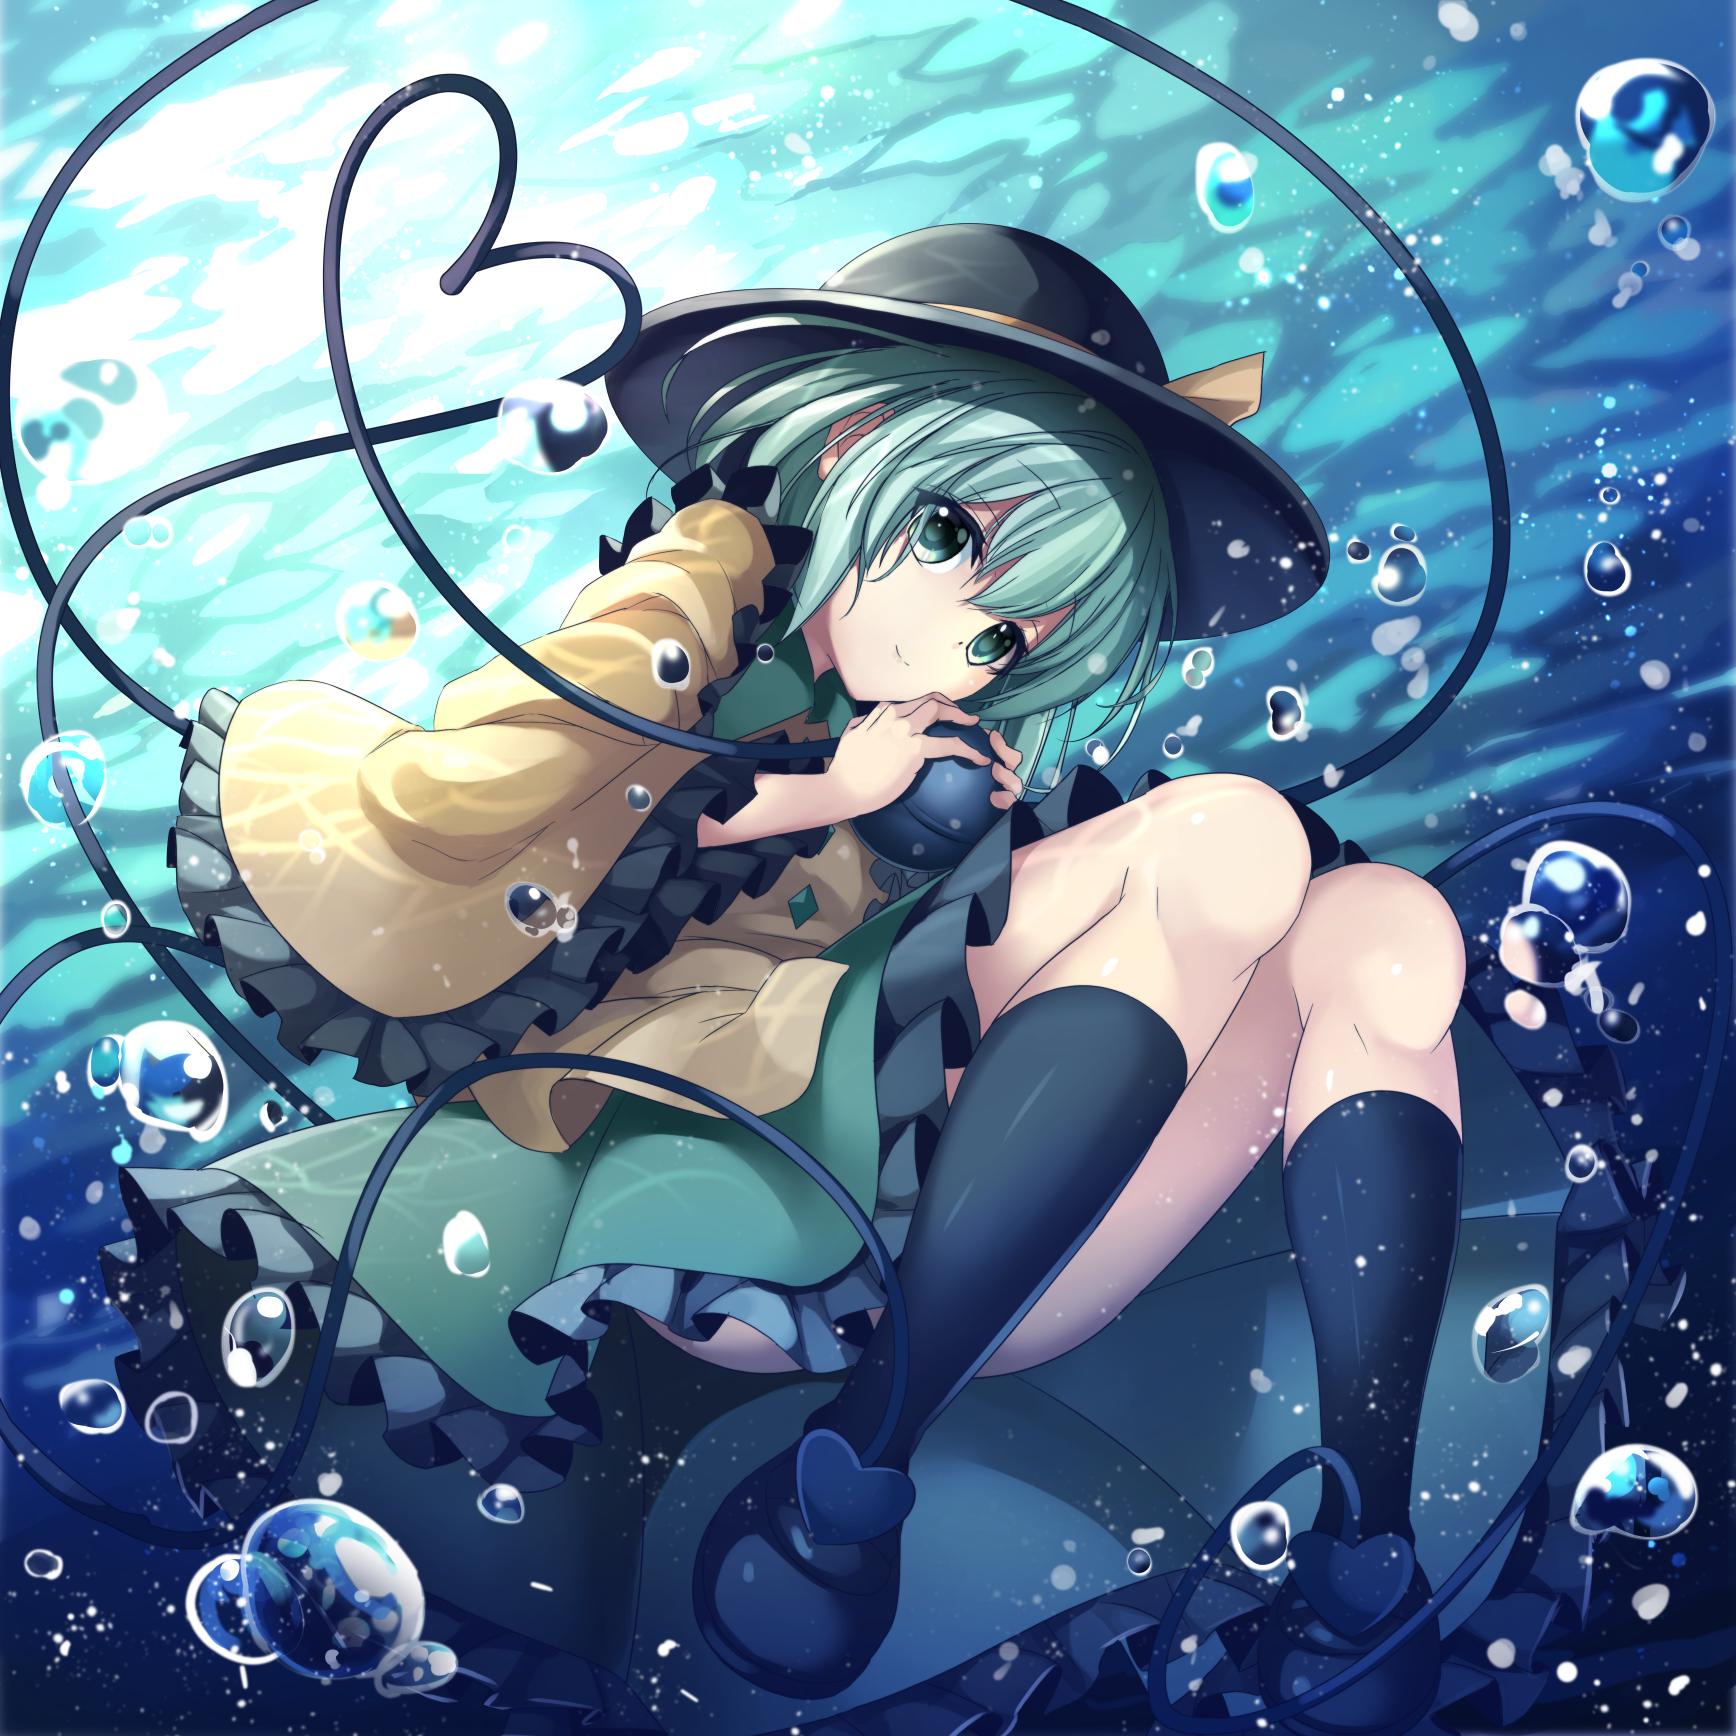 Komeiji Koishi 画像あり アニメの女の子 壁紙の背景